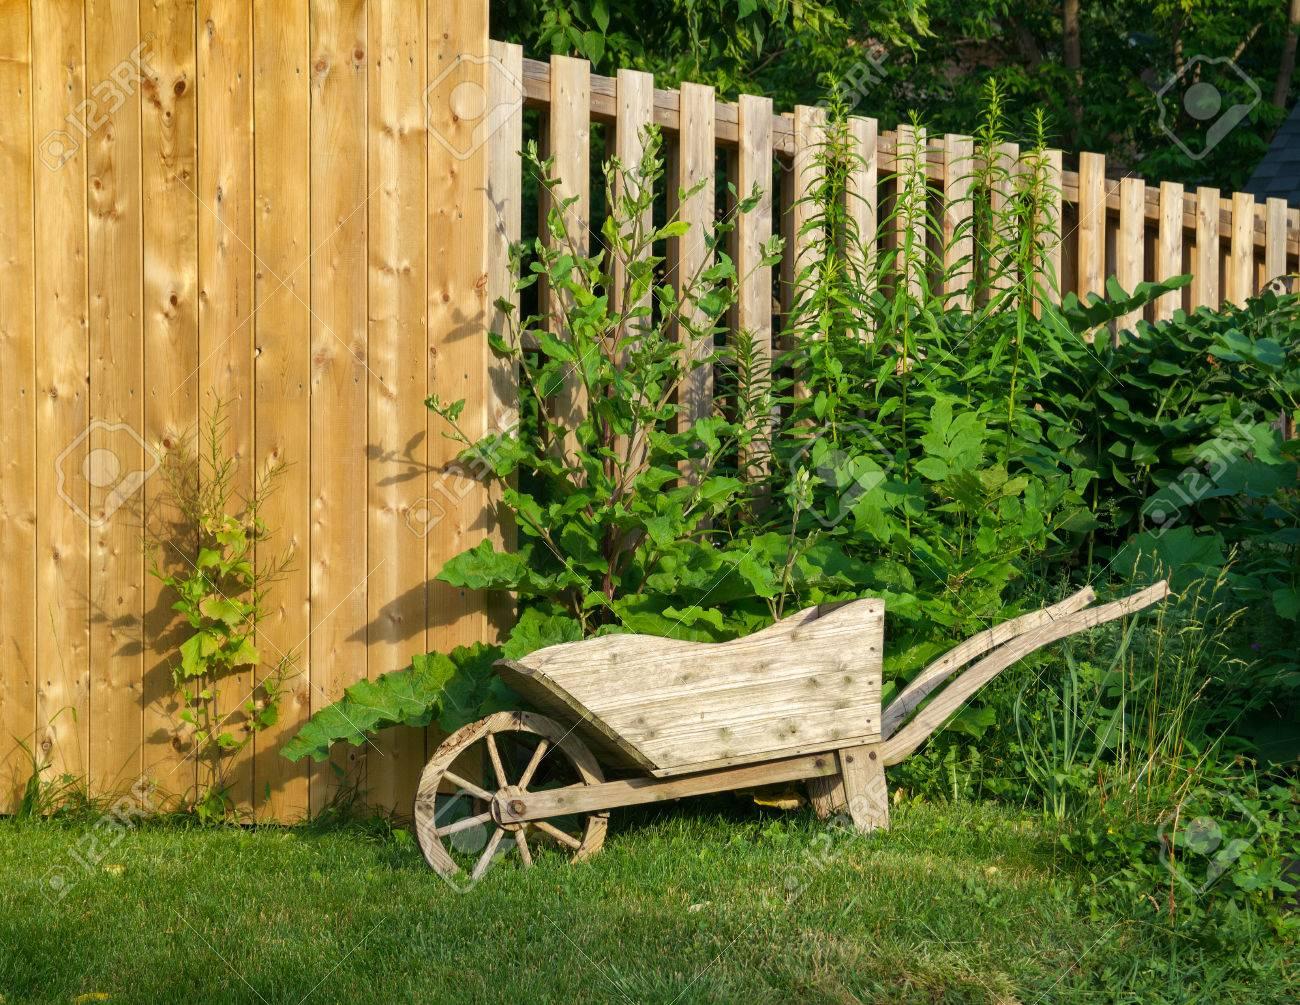 Decorative Wooden Wheelbarrow Planter Near Wooden Fence Stock Photo ...